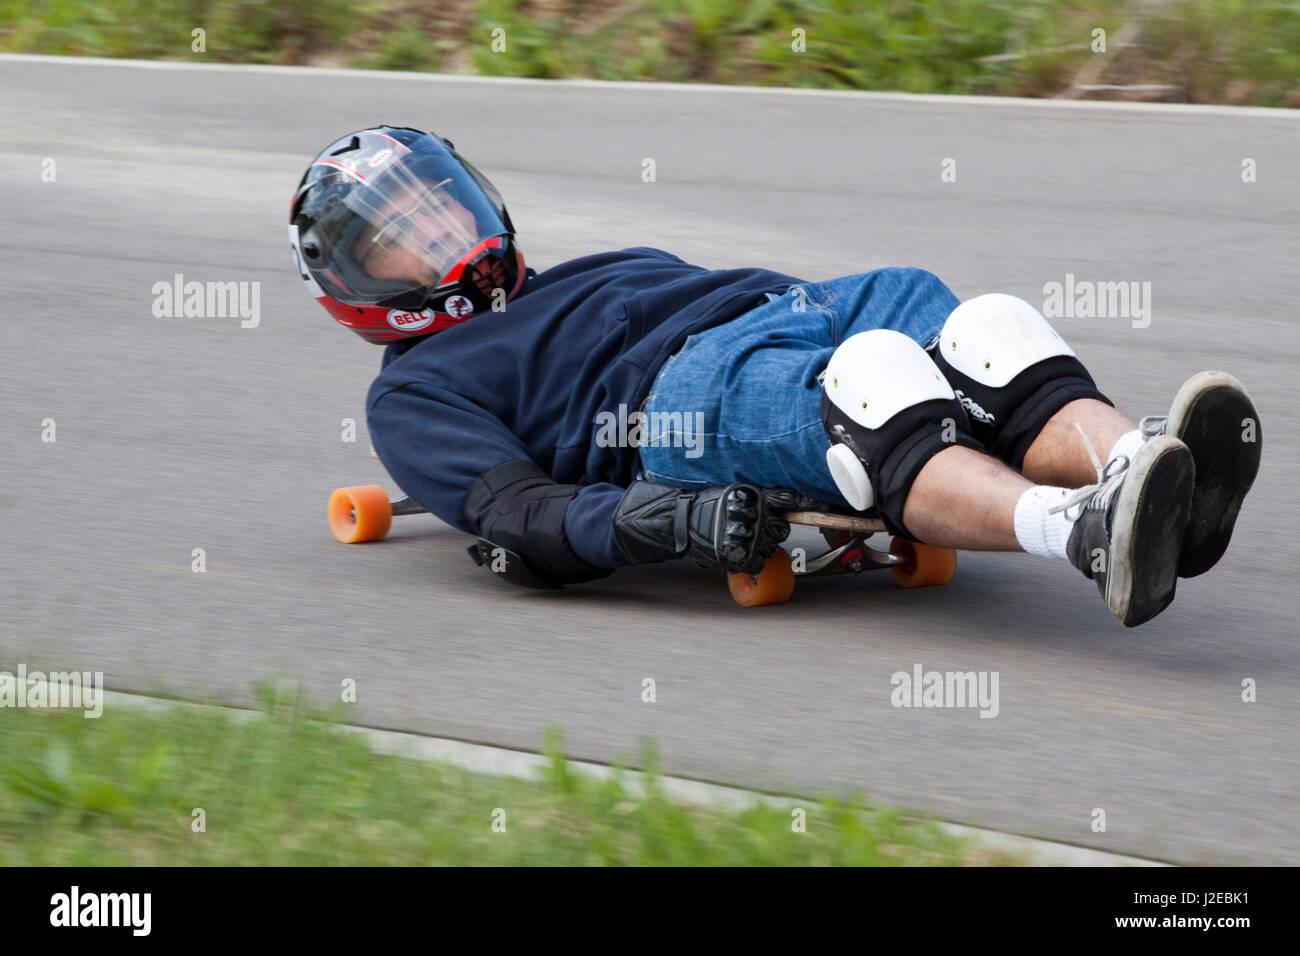 Buckboarders racing downhill on a closed circuit - Stock Image